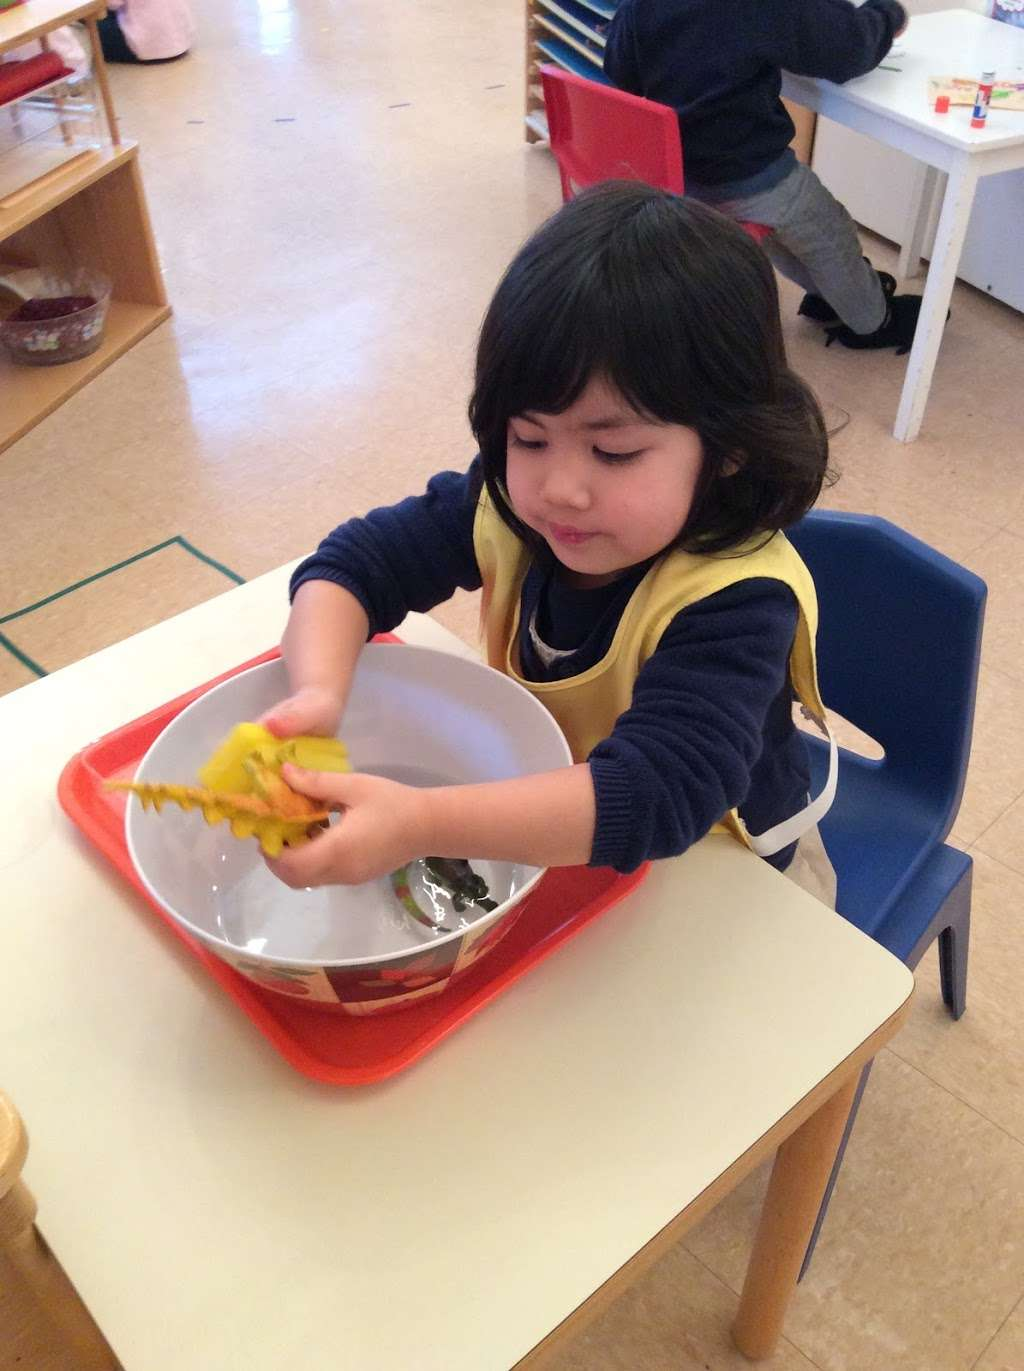 Village Montessori School - school  | Photo 8 of 10 | Address: 33874 Snickersville Turnpike, Bluemont, VA 20135, USA | Phone: (540) 454-7514